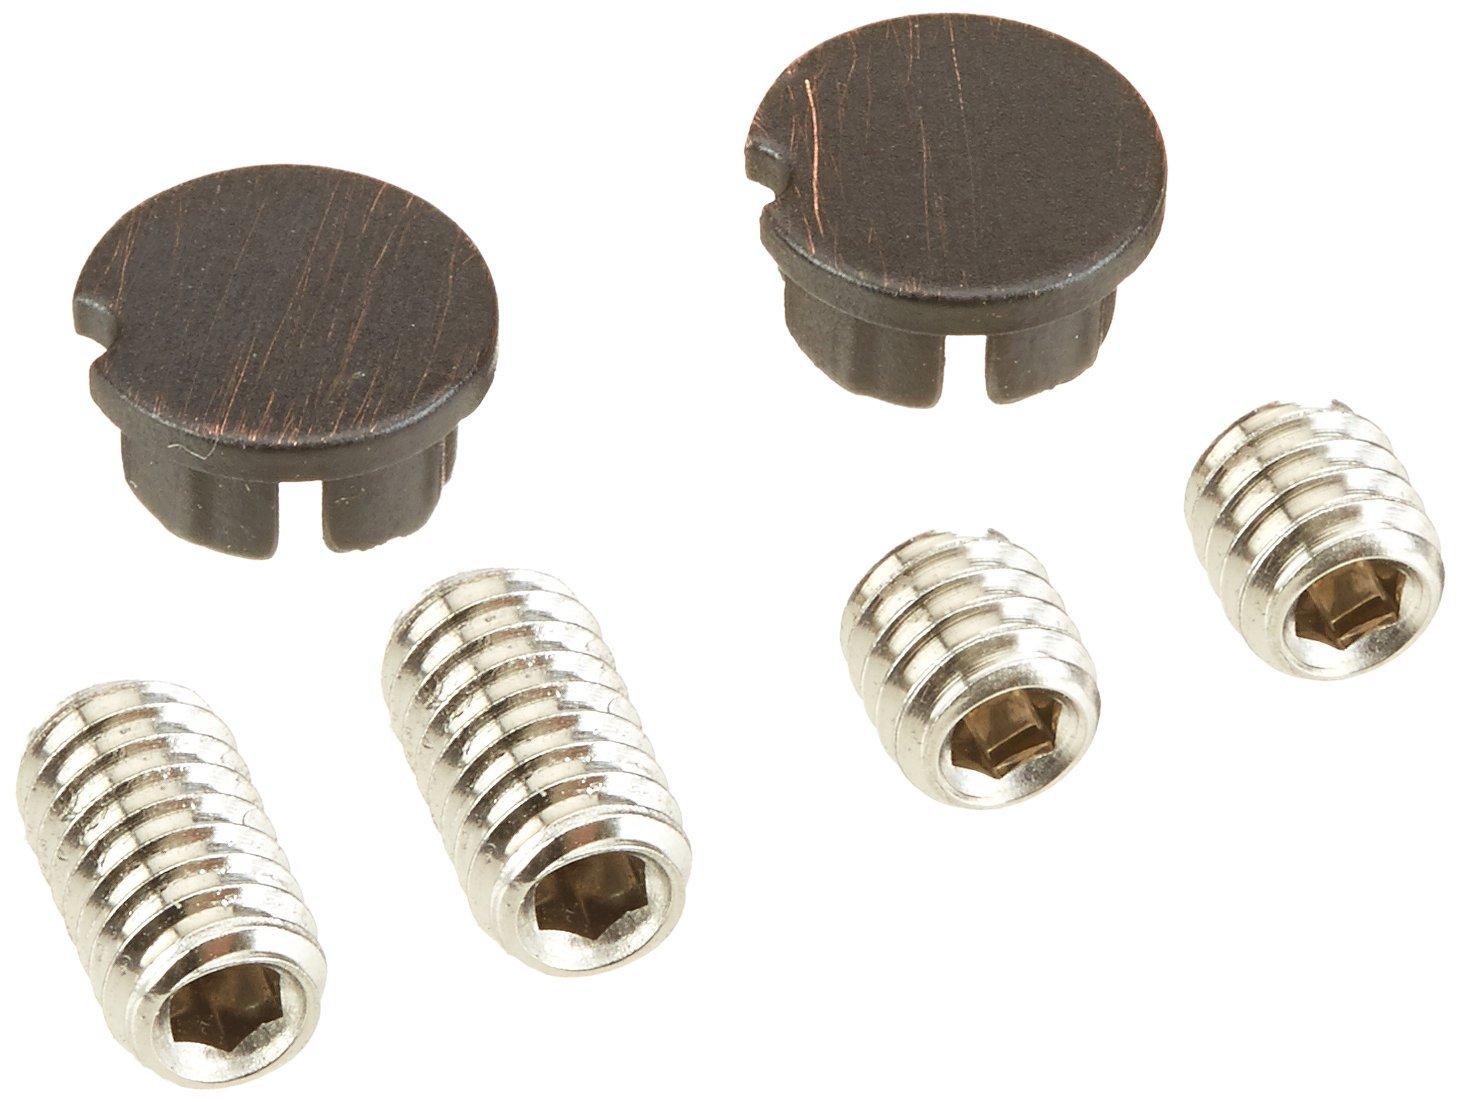 Delta Faucet RP51095RB 14S Set Screw and Button-Vero, Venetian Bronze